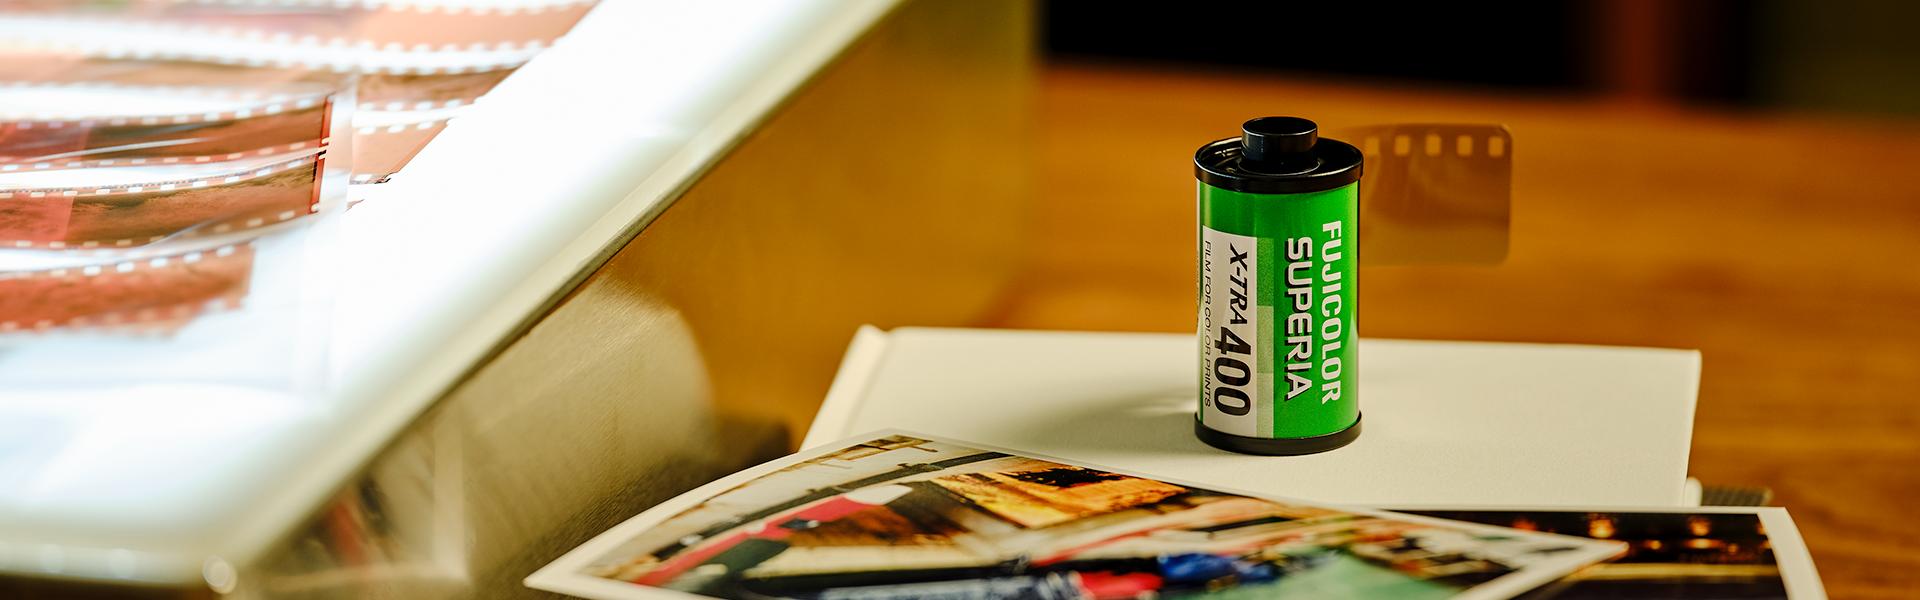 Filmler ve QuickSnap